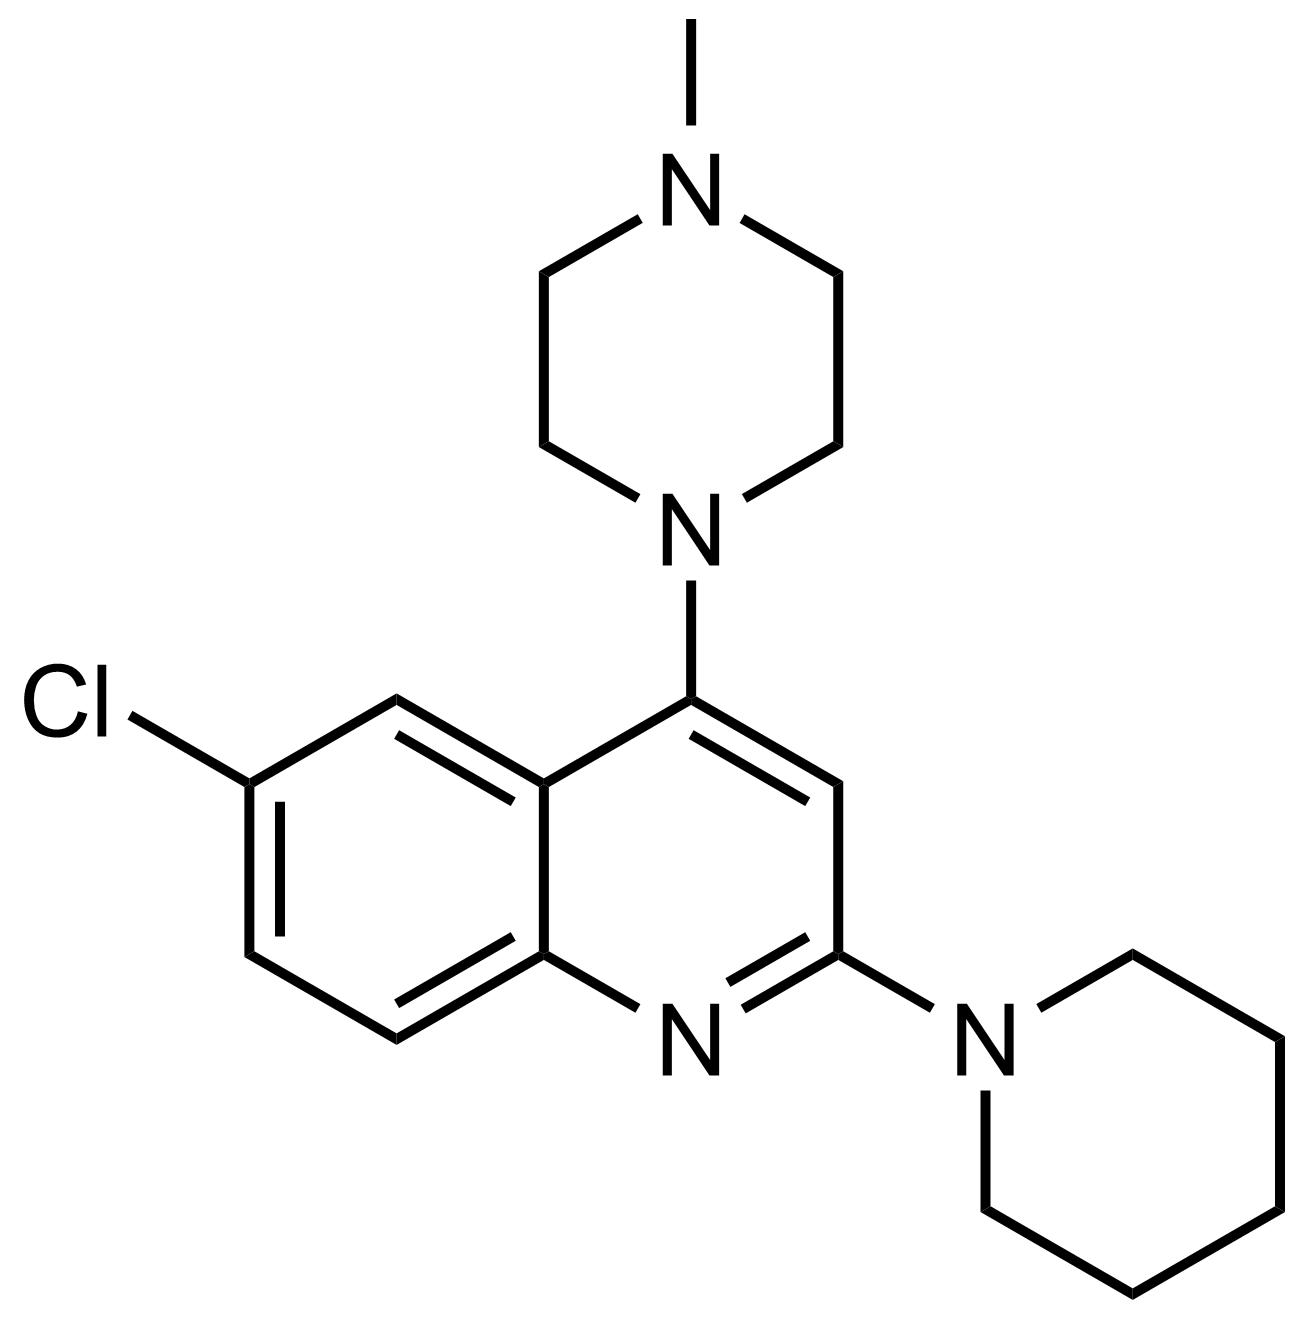 Structure of 6-Chloro-4-(4-methylpiperazin-1-yl)-2-(piperidin-1-yl)quinoline